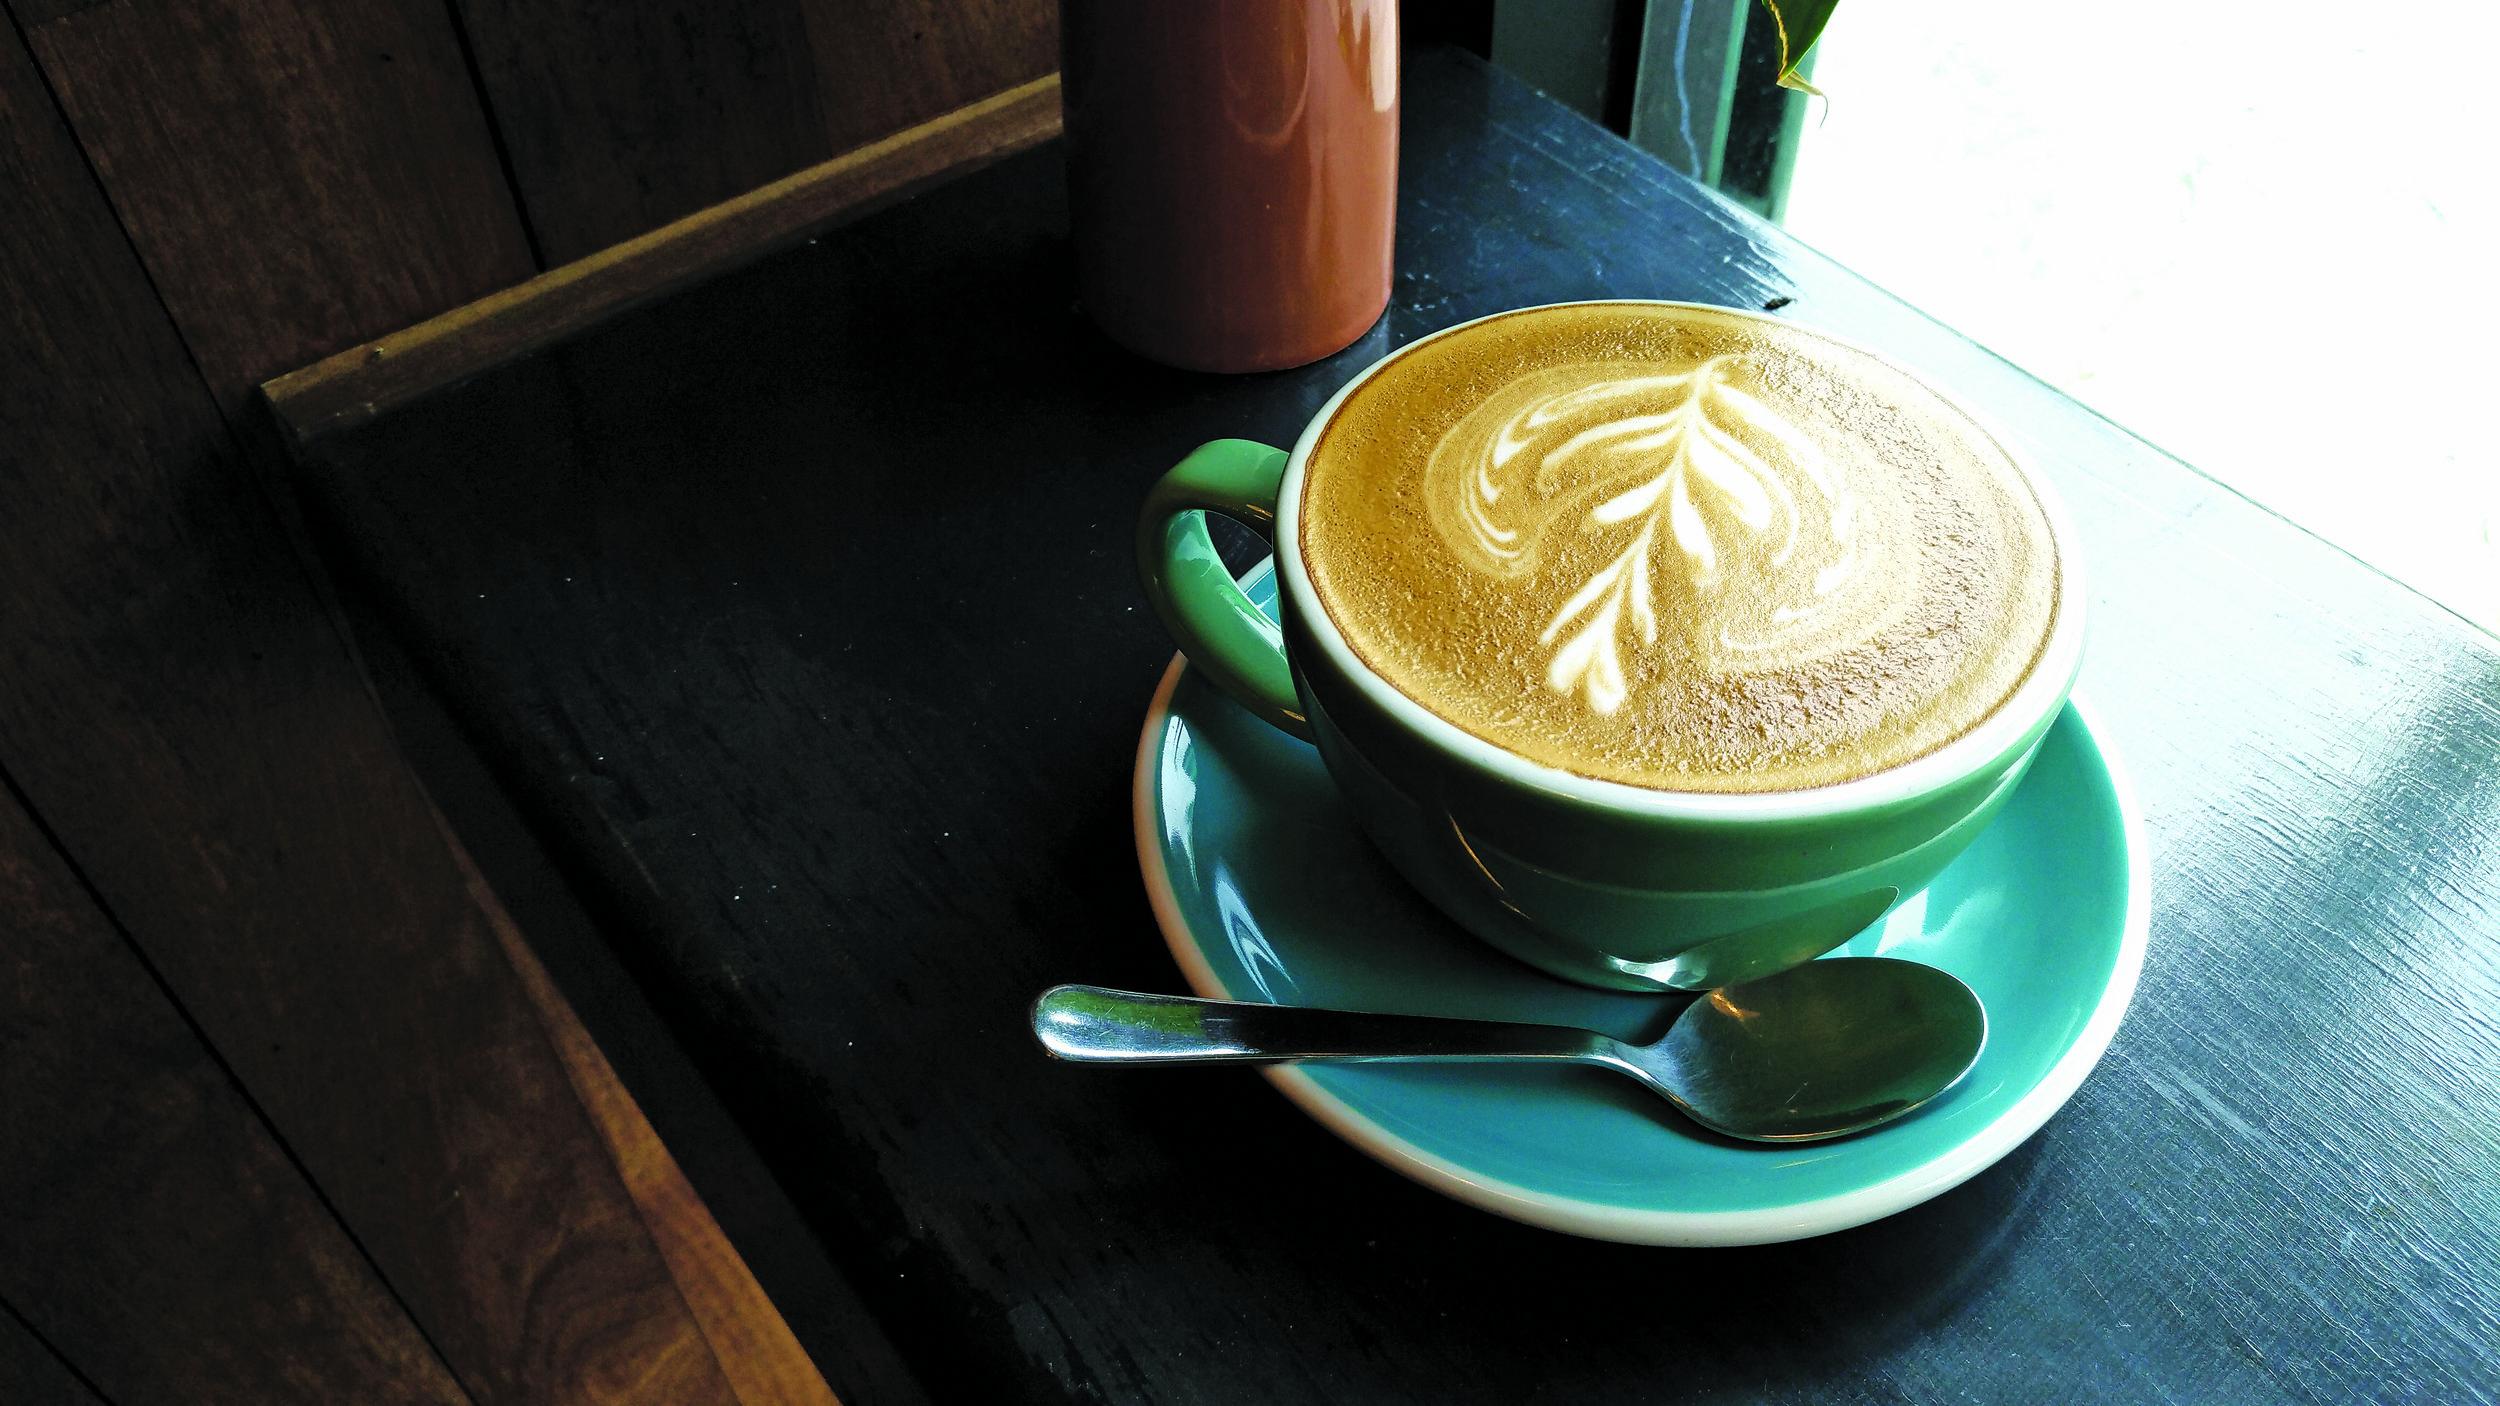 LatteTealMug.jpg